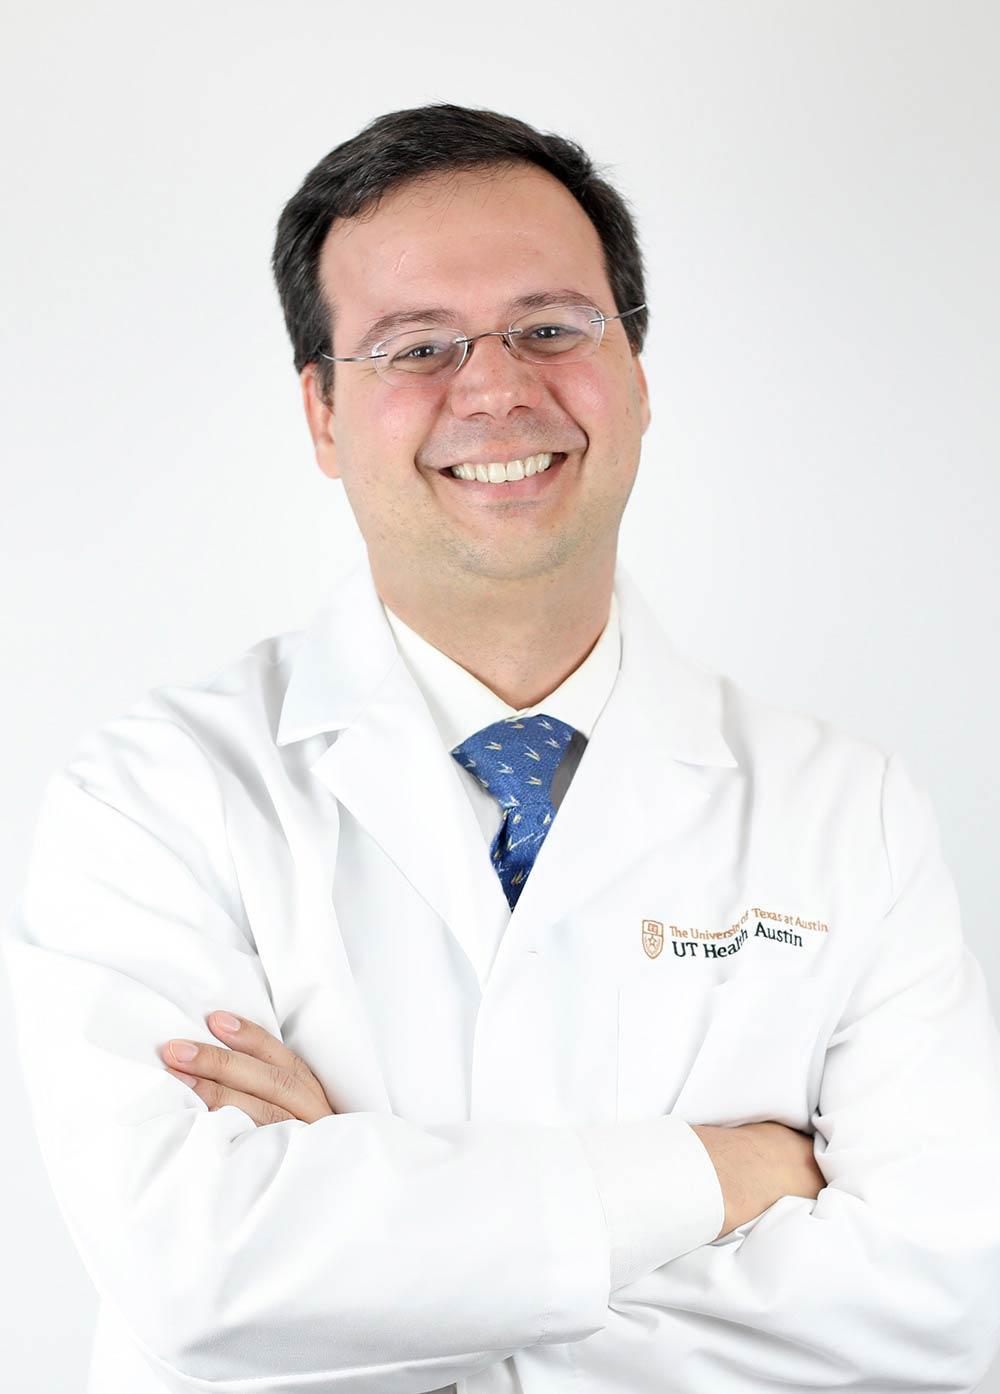 Headshot of Jorge Almeida